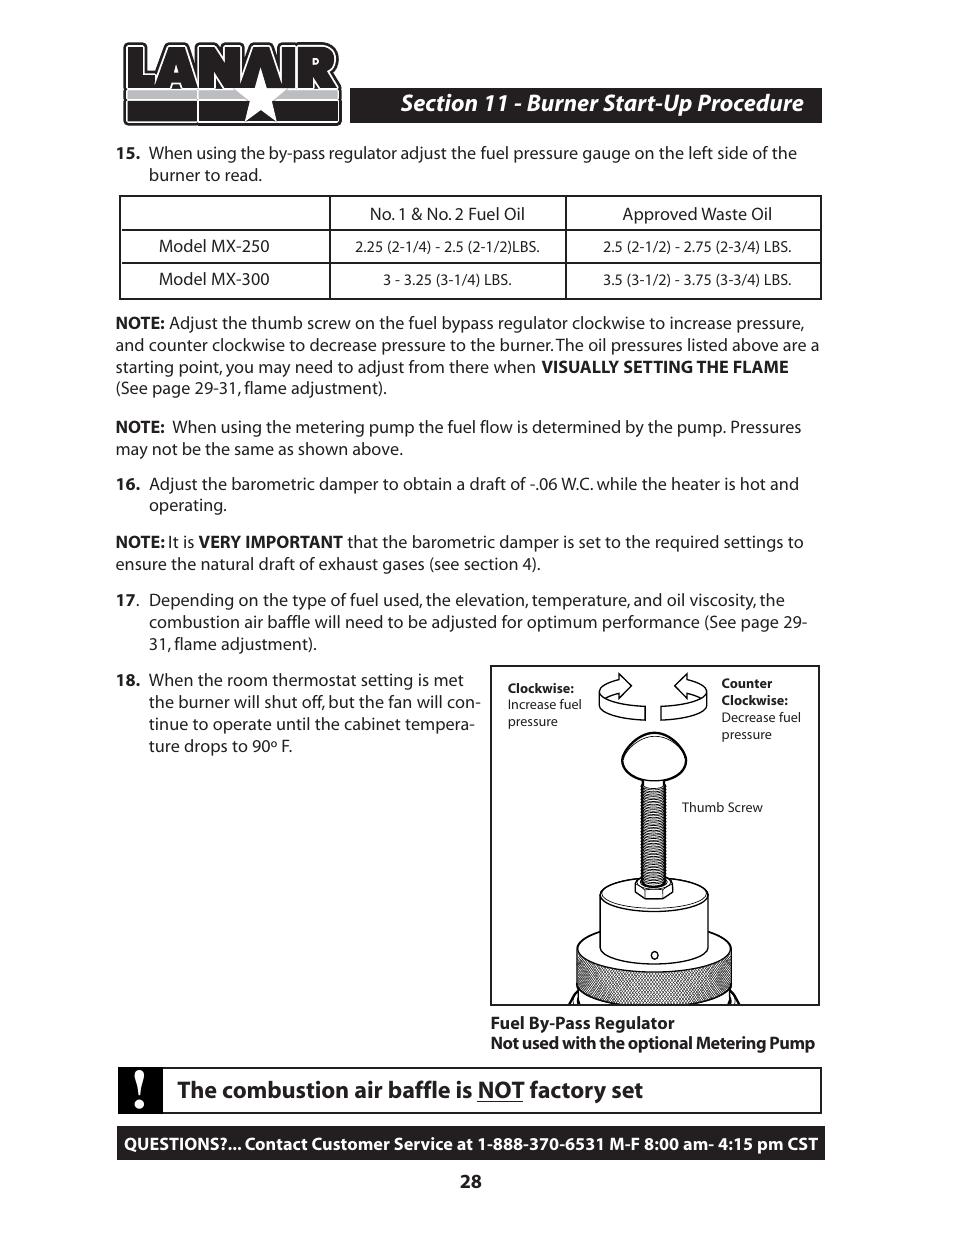 the combustion air baffle is not factory set lanair mx300 user rh manualsdir com